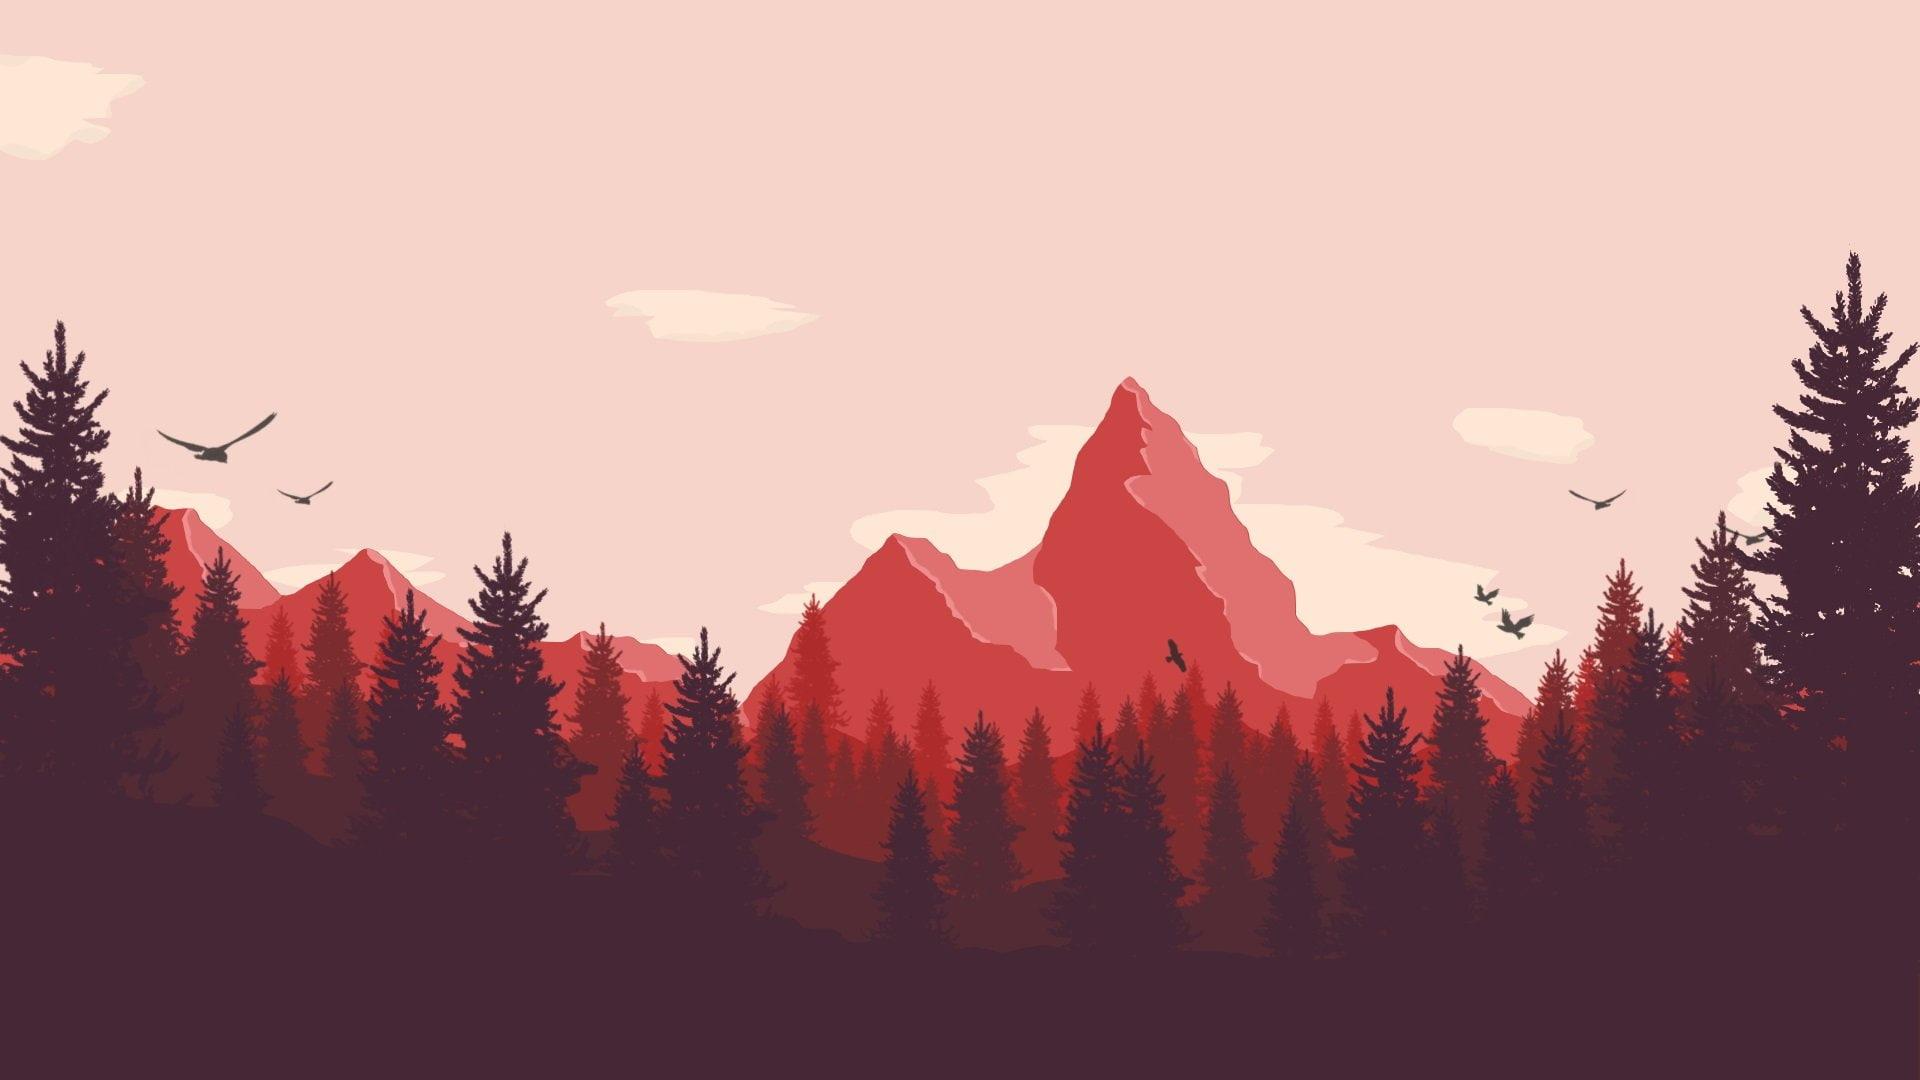 firewatch wallpaper,sky,mountainous landforms,mountain,nature,natural landscape